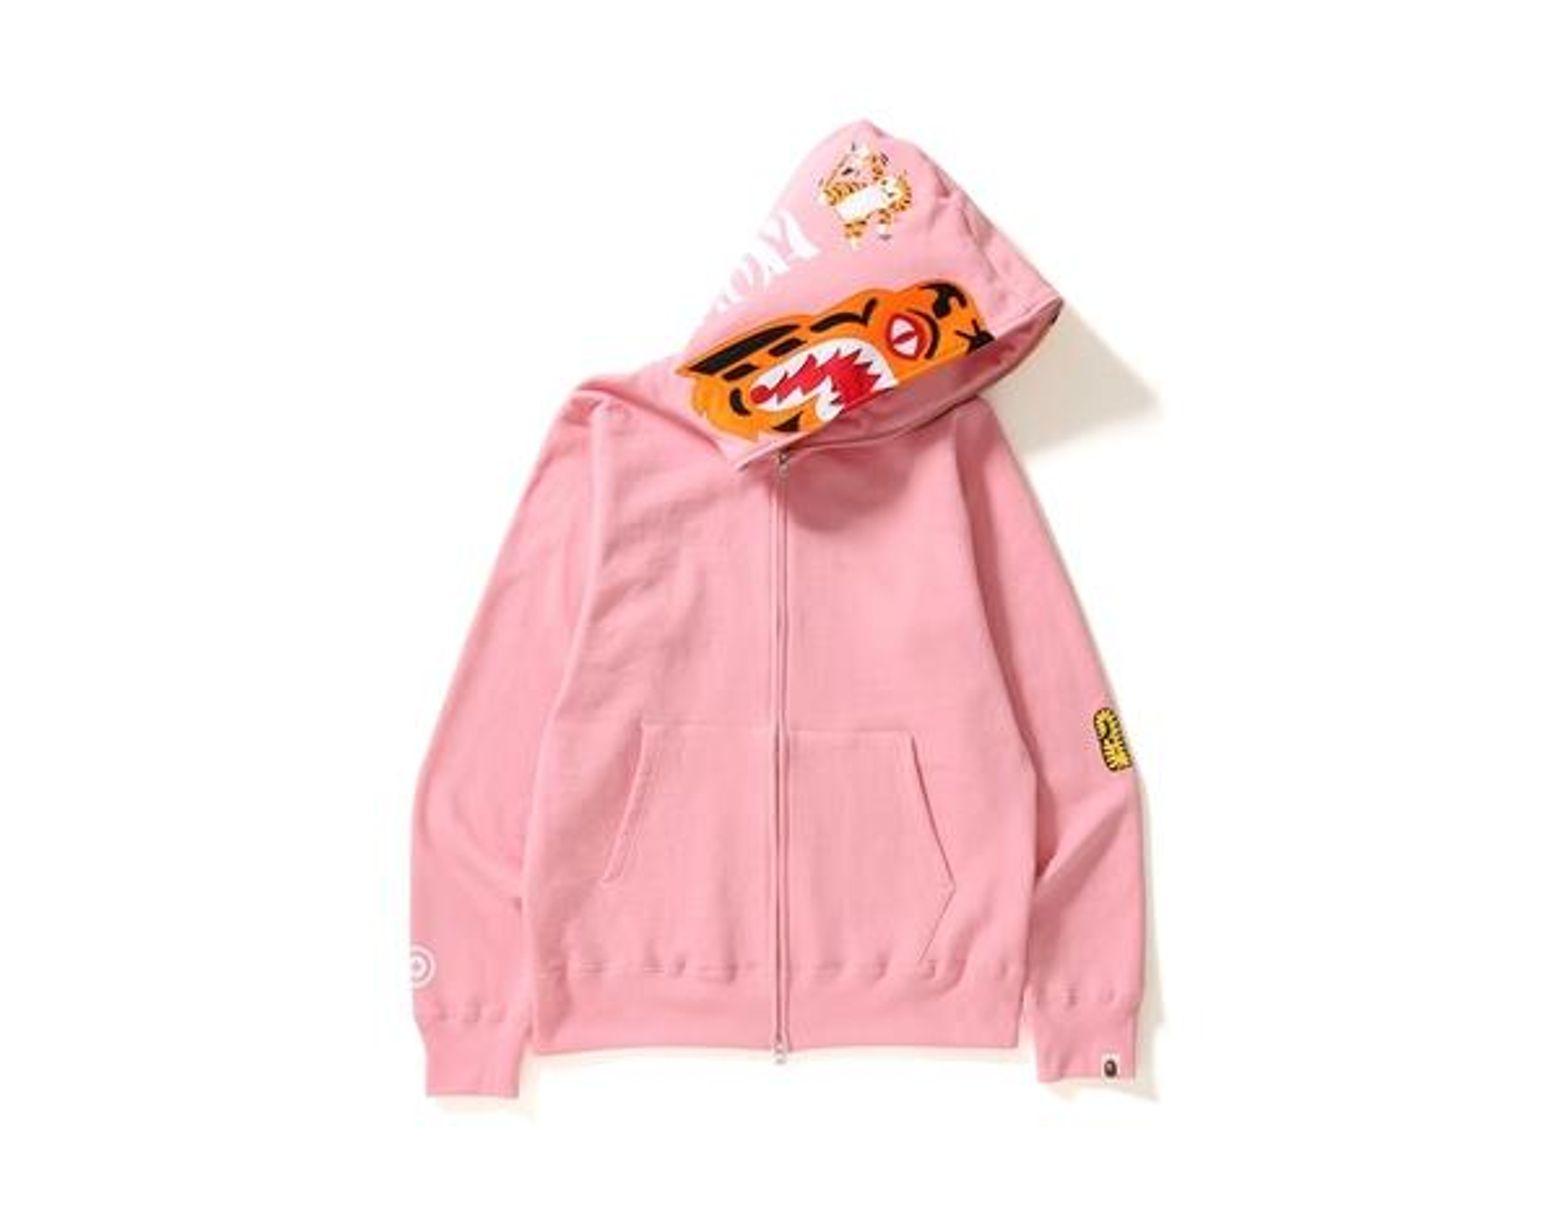 9b31216f A Bathing Ape Tiger Full Zip Hoodie Pink in Pink for Men - Lyst